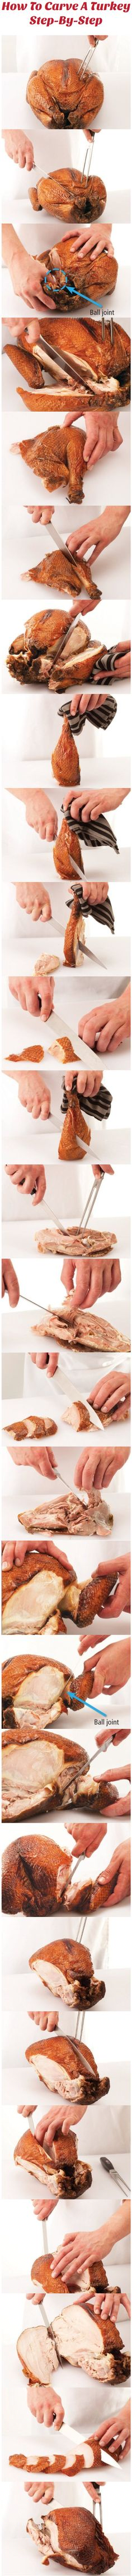 How To Carve A Turkey, Step-By-Step